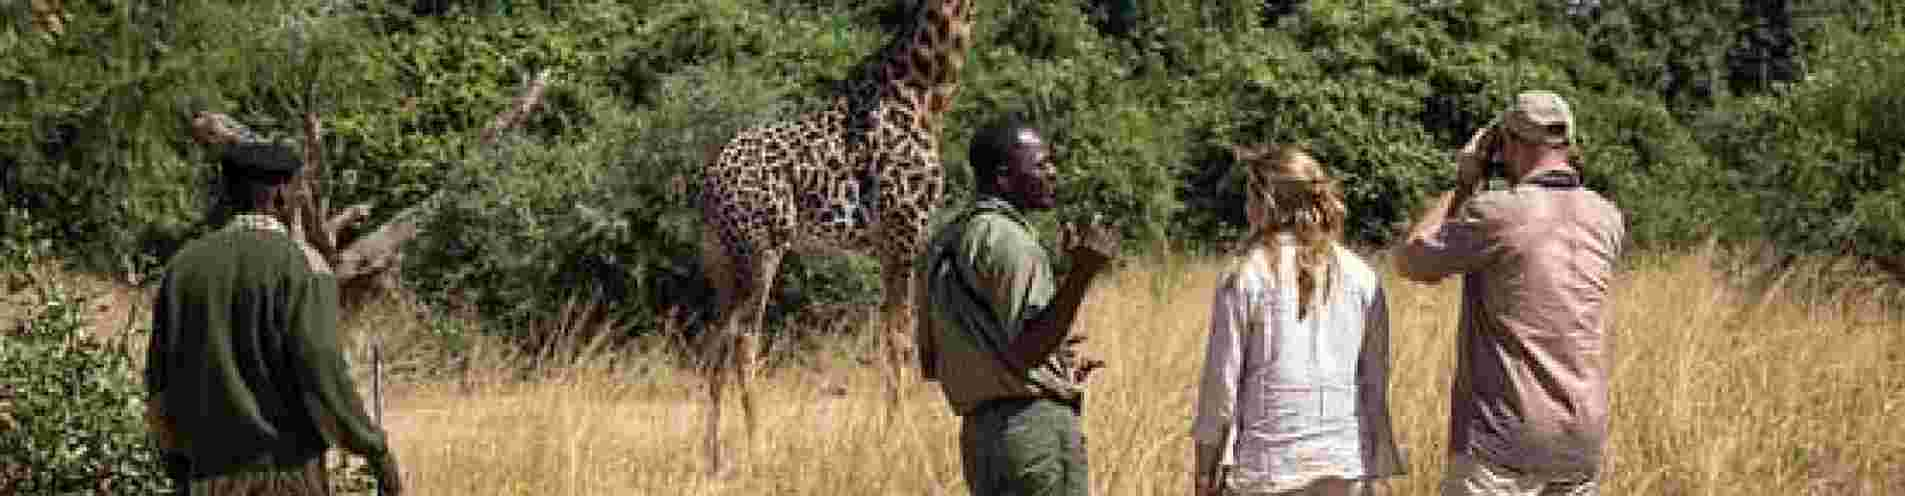 SOUTH LUANGWA NATIONAL PARK header image